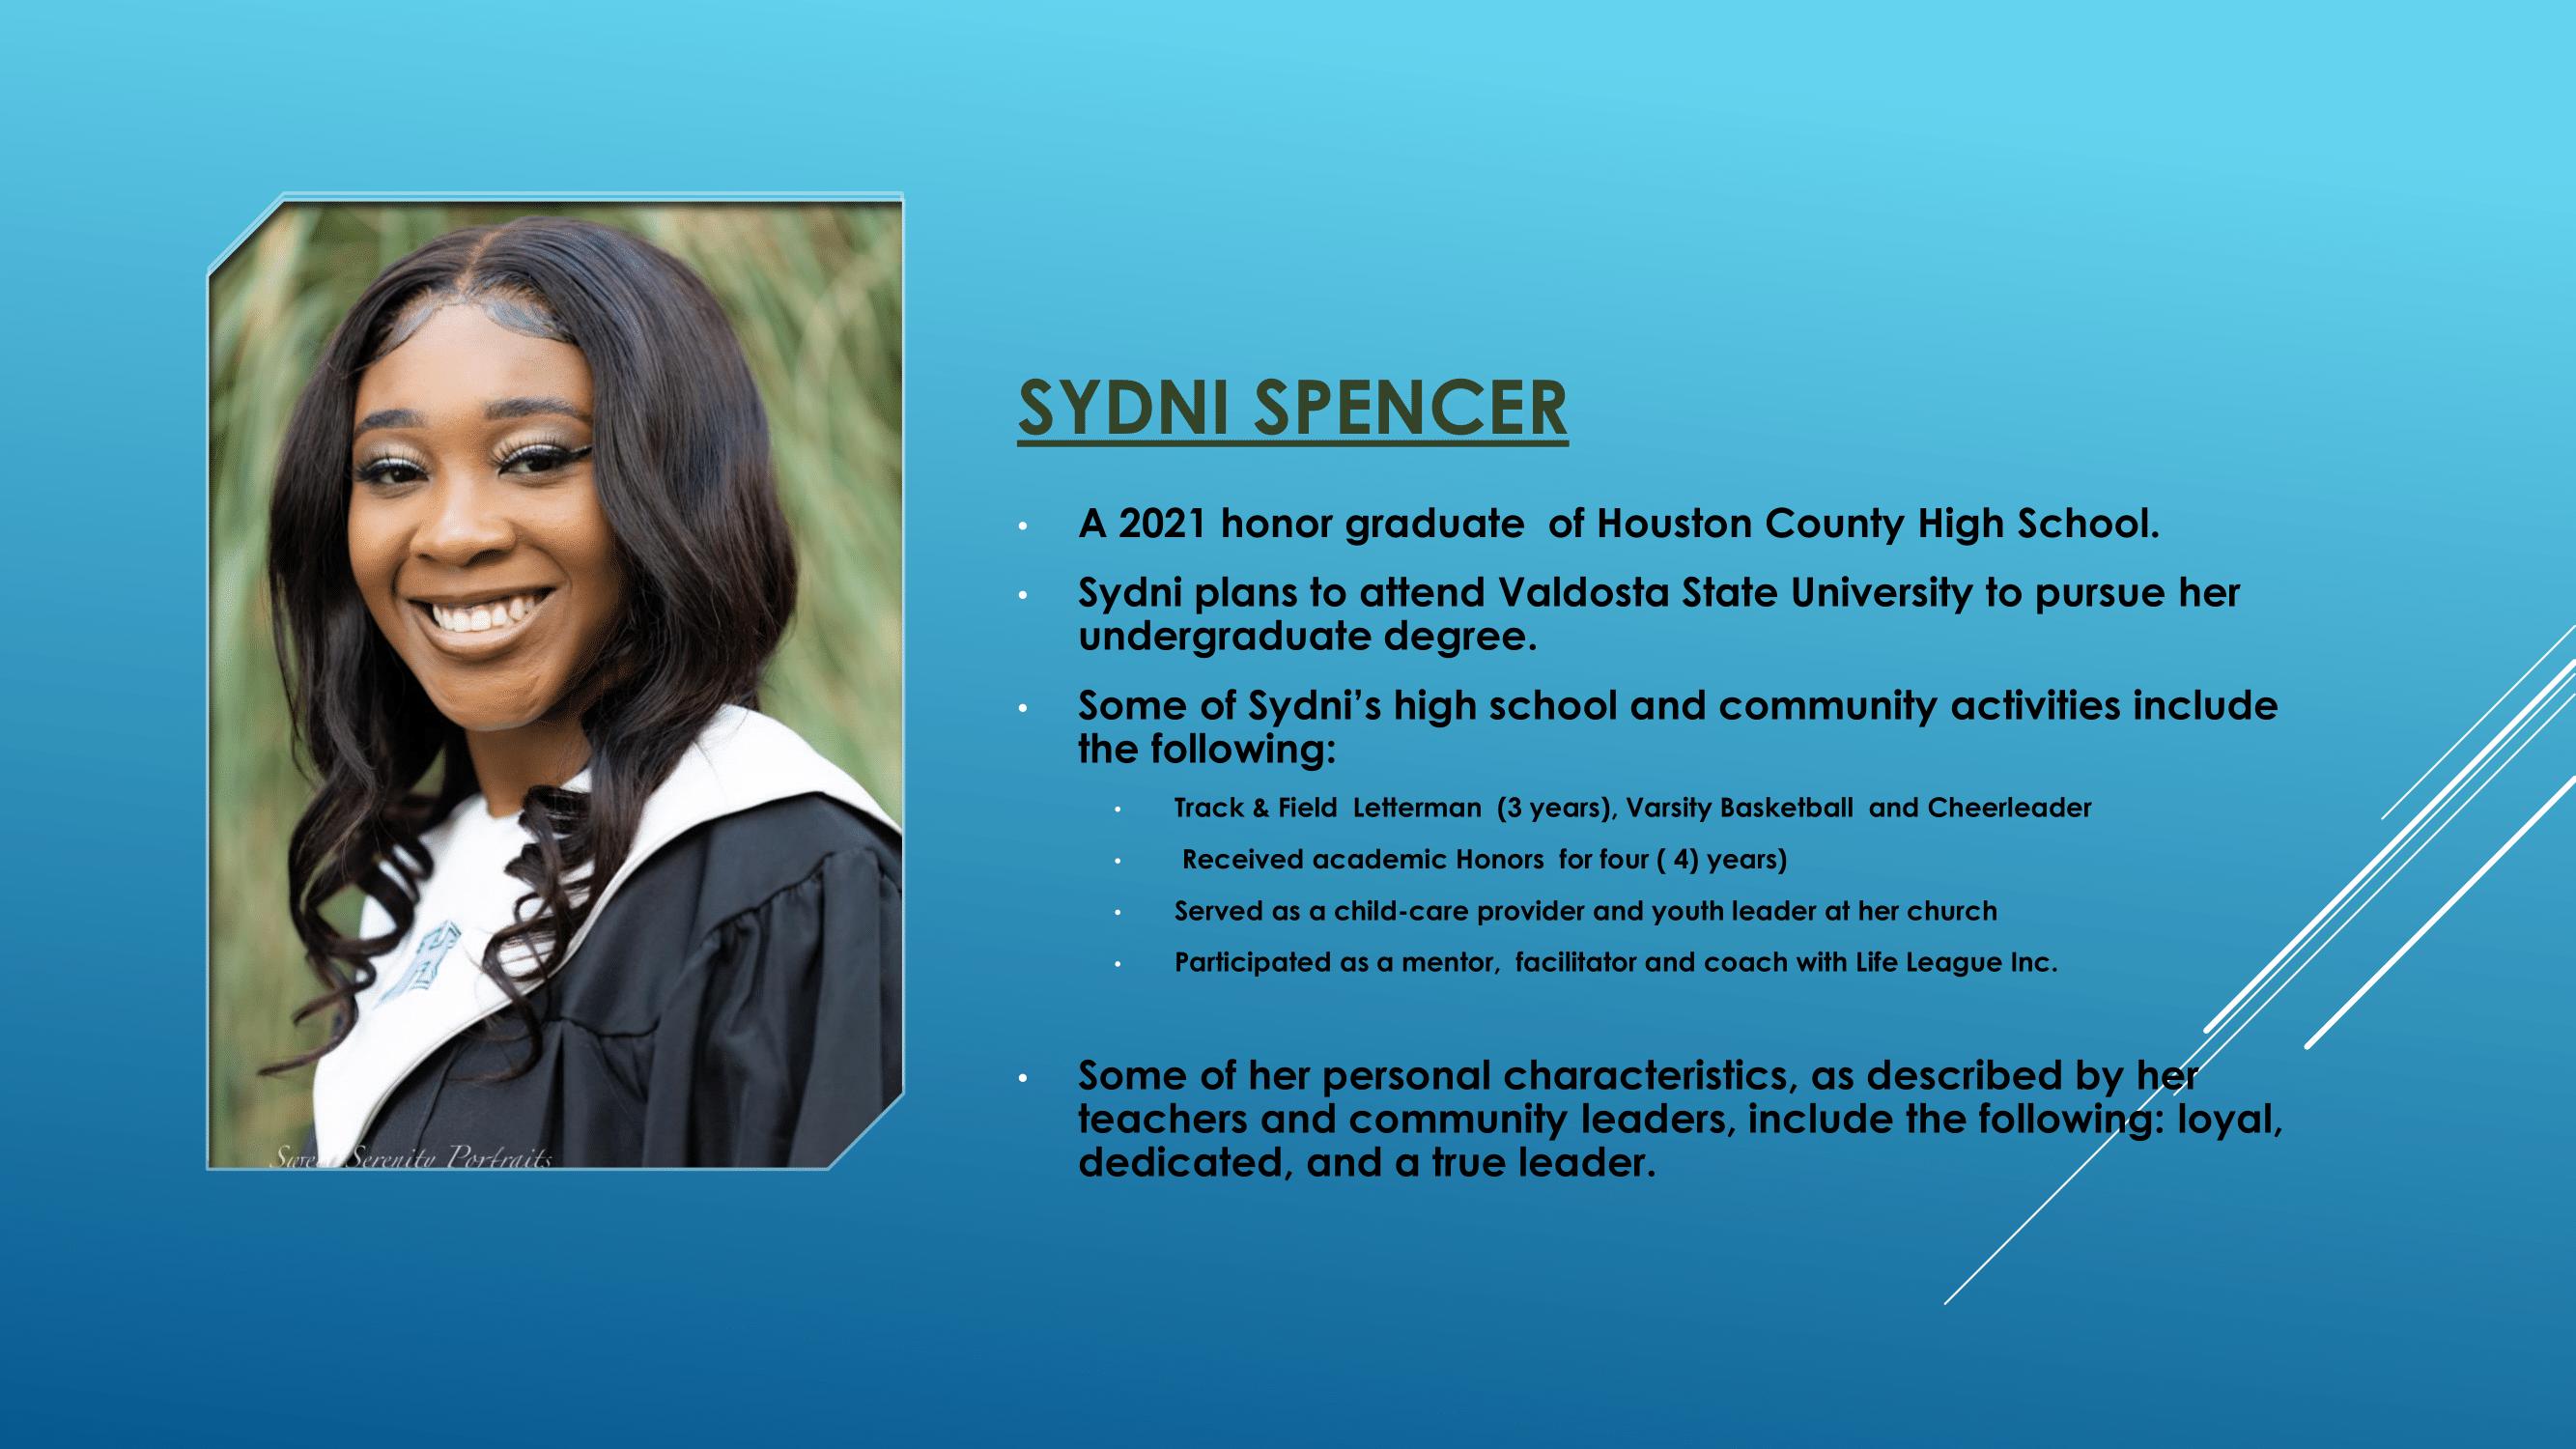 Nece Hopson Memorial Foundation  (NHMF) scholarship 2021 Recipient Sydni Spencer